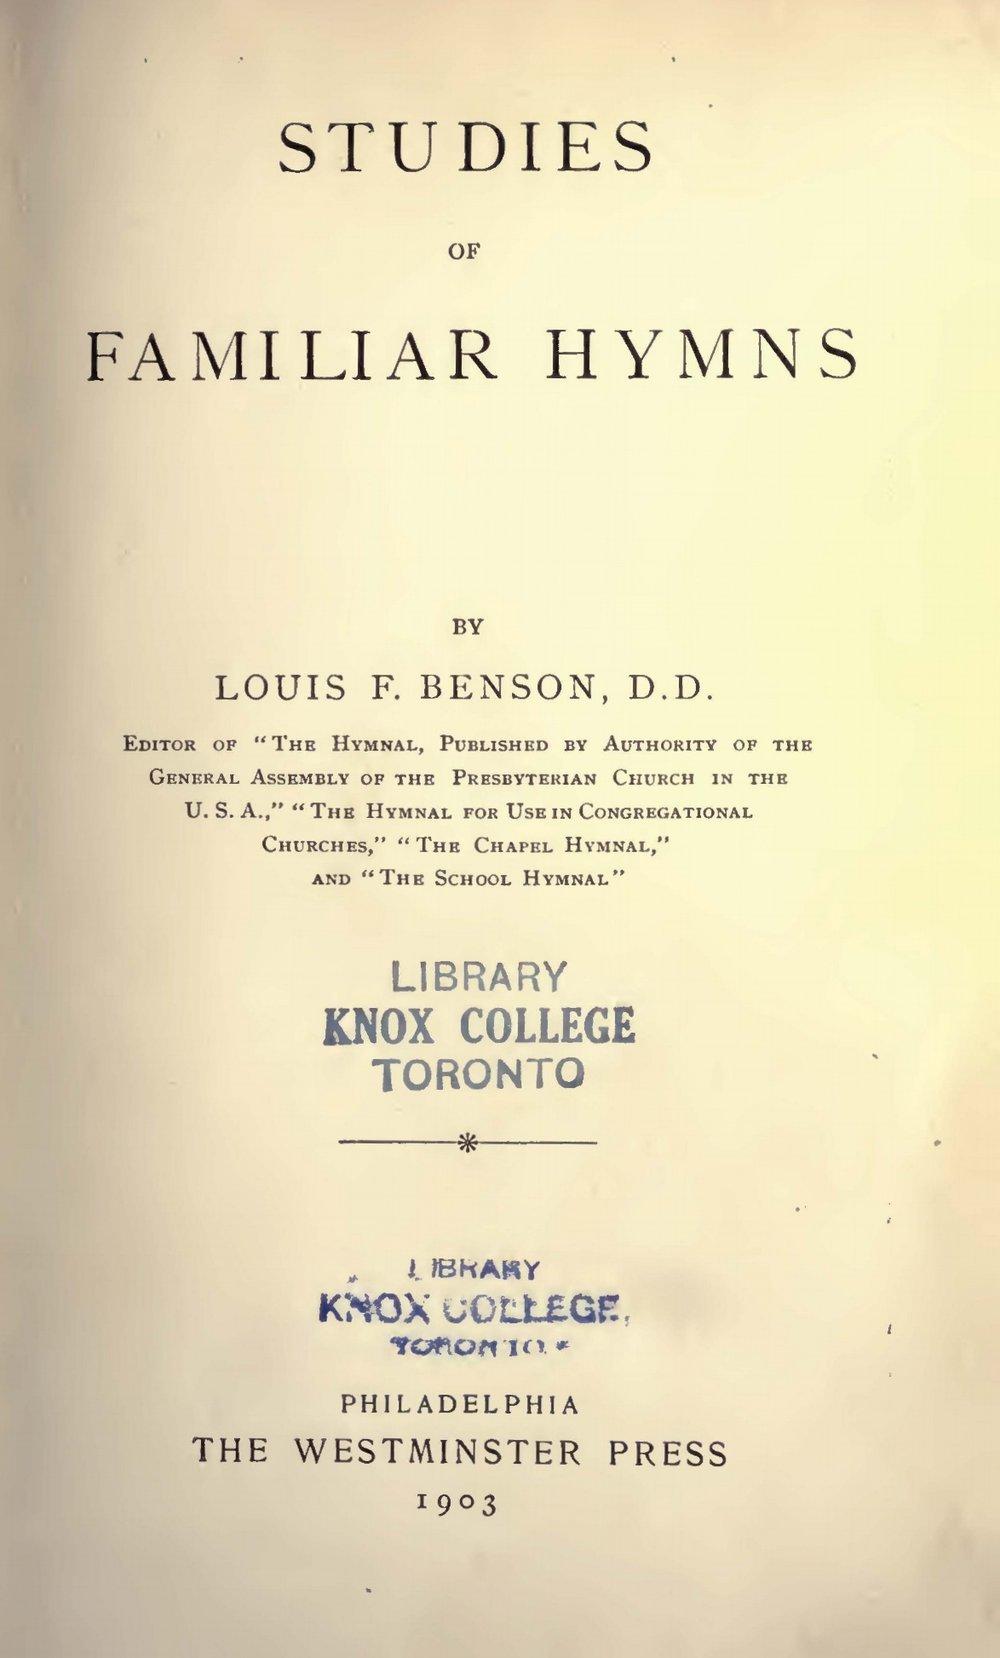 Benson, Louis FitzGerald, Studies of Familiar Hymns Title Page.jpg